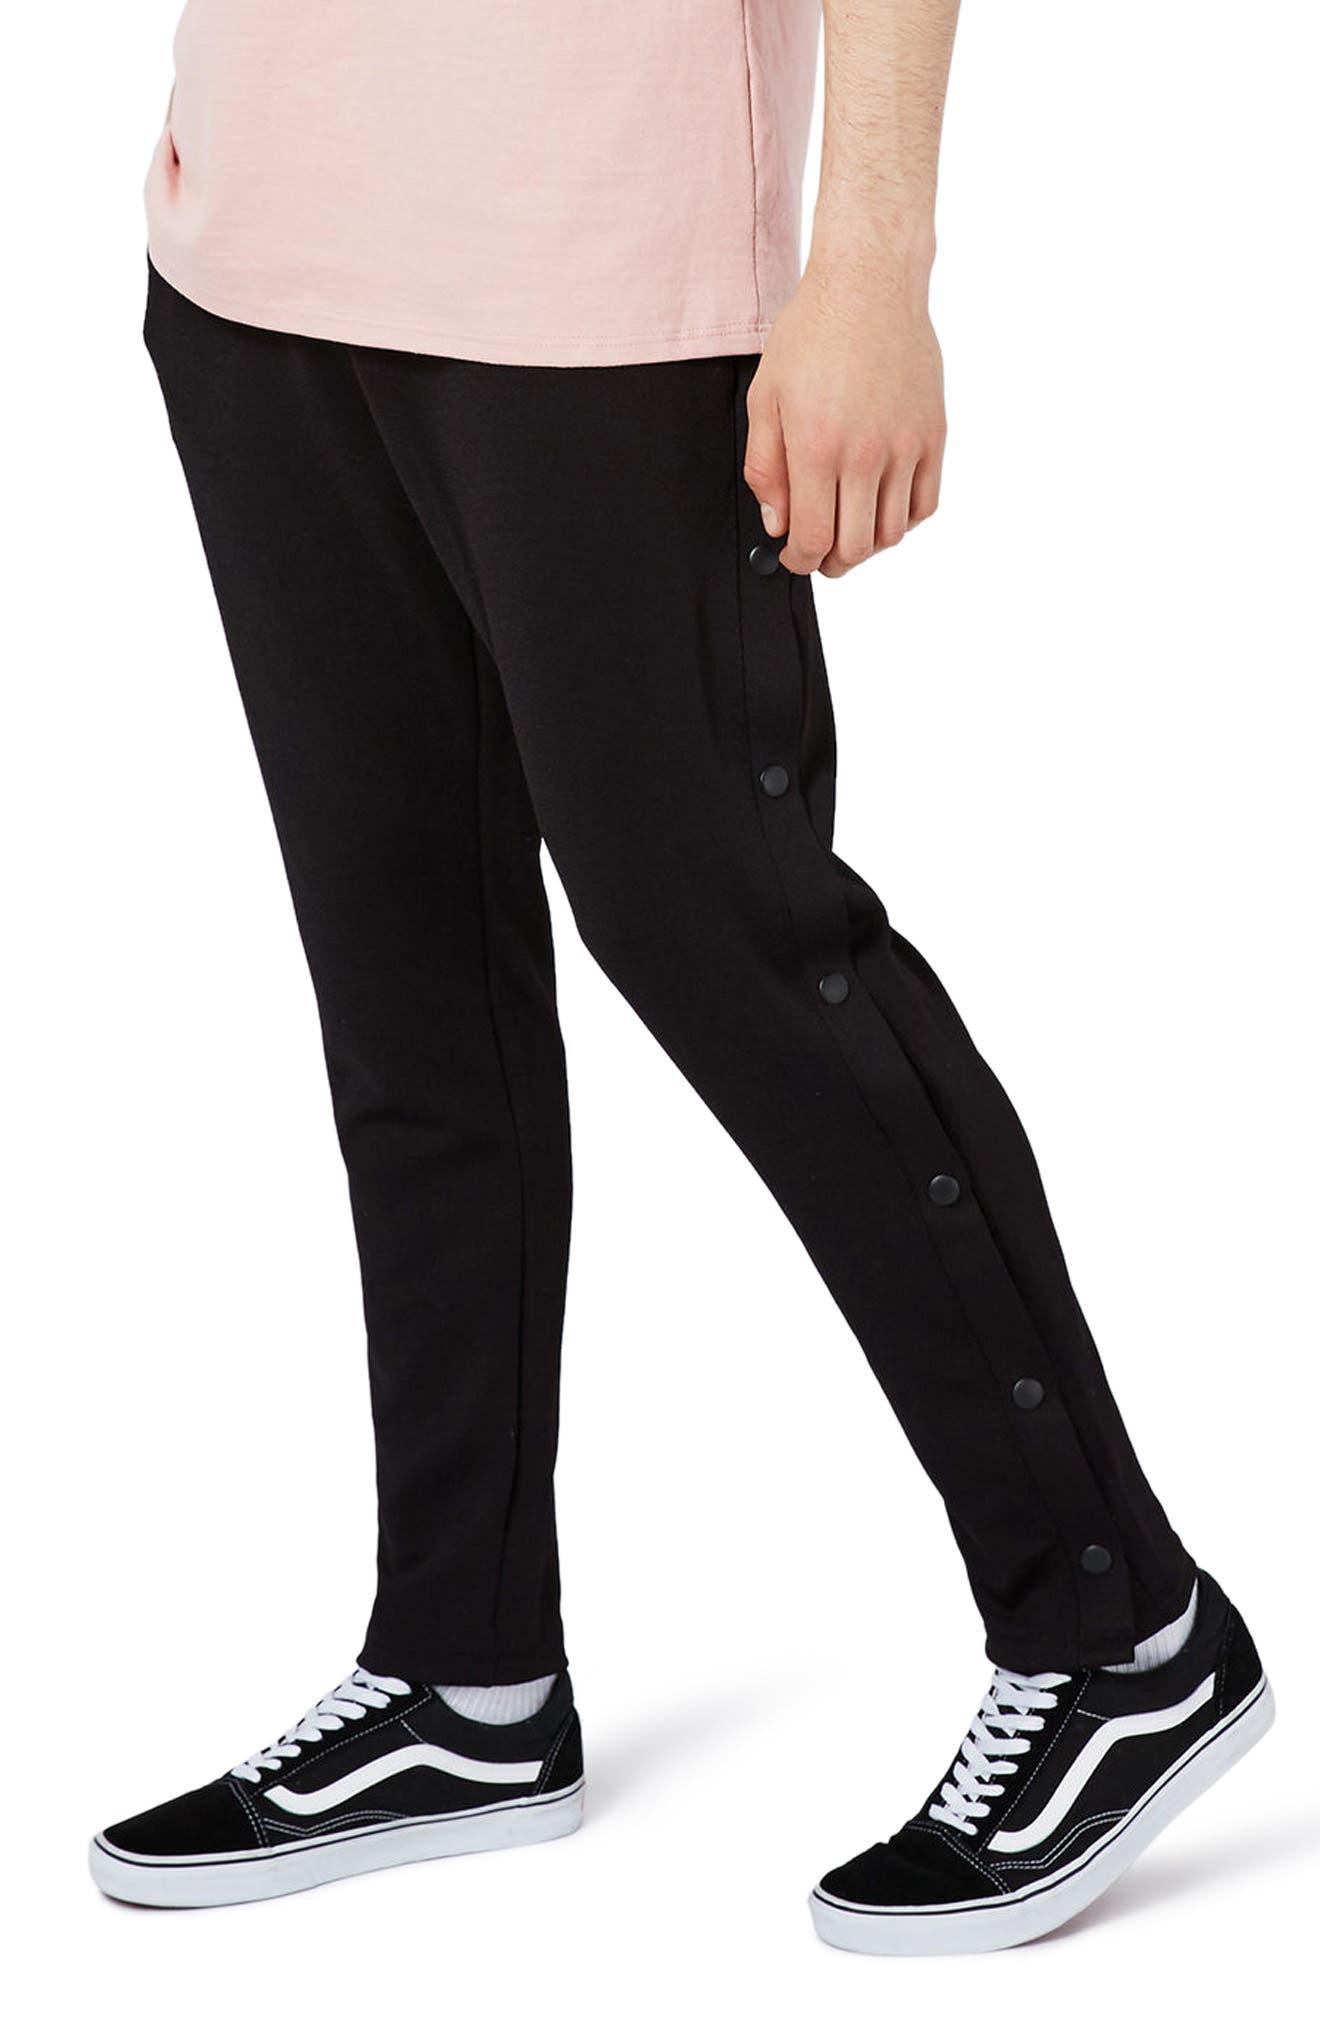 Topman Tearaway Jogger Pants